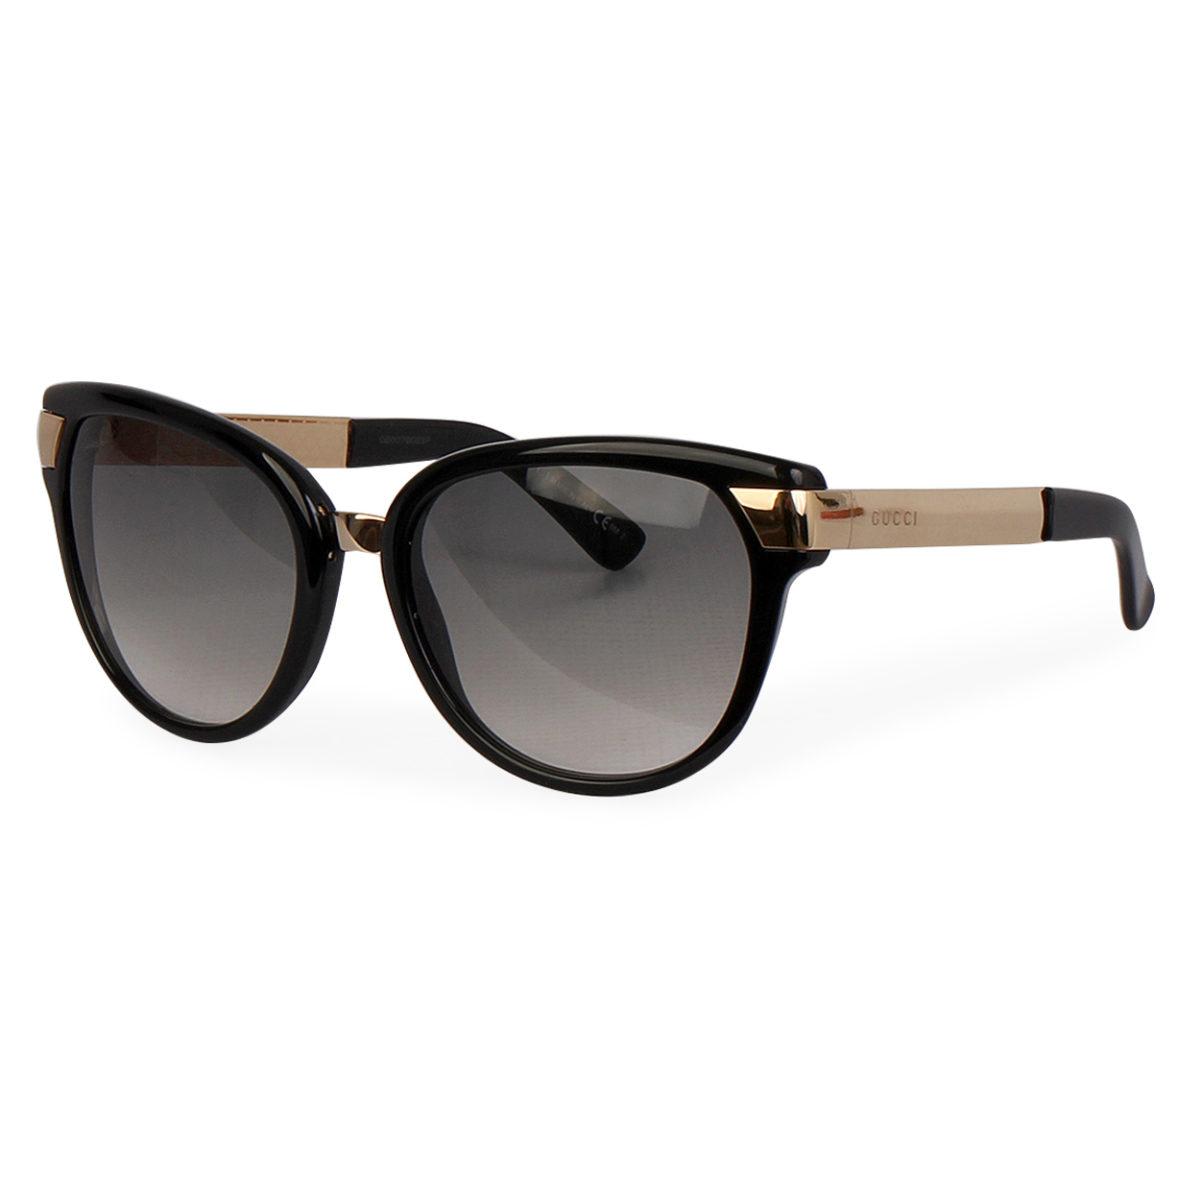 eacbe130fda GUCCI Sunglasses GG ANWYR Black Gold